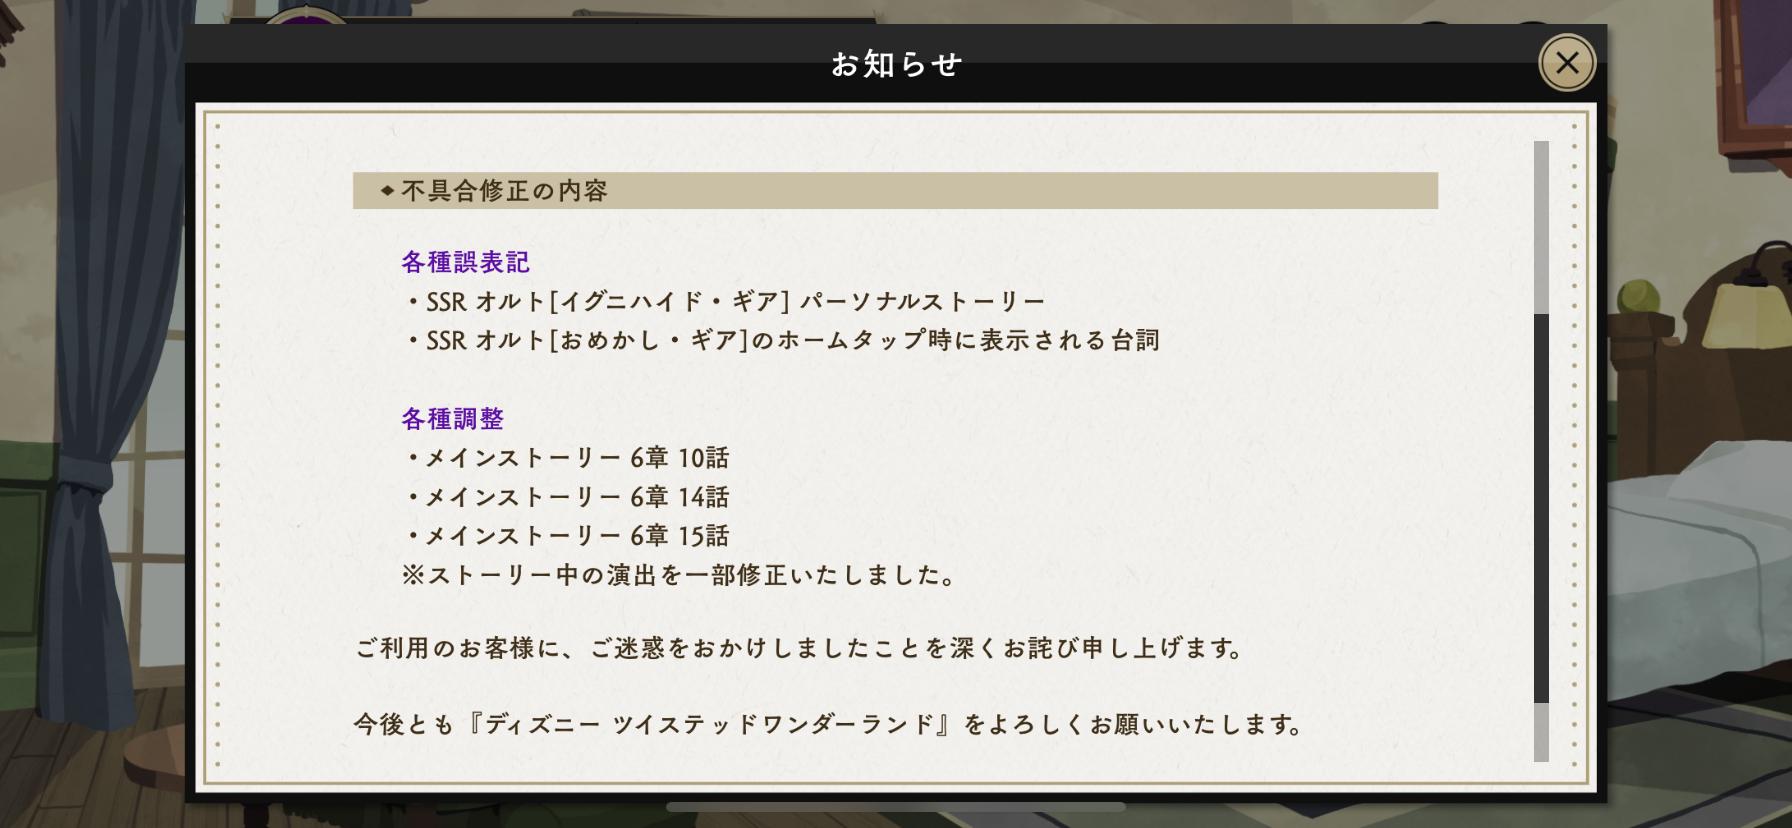 f:id:motimoti444:20210901215147p:plain